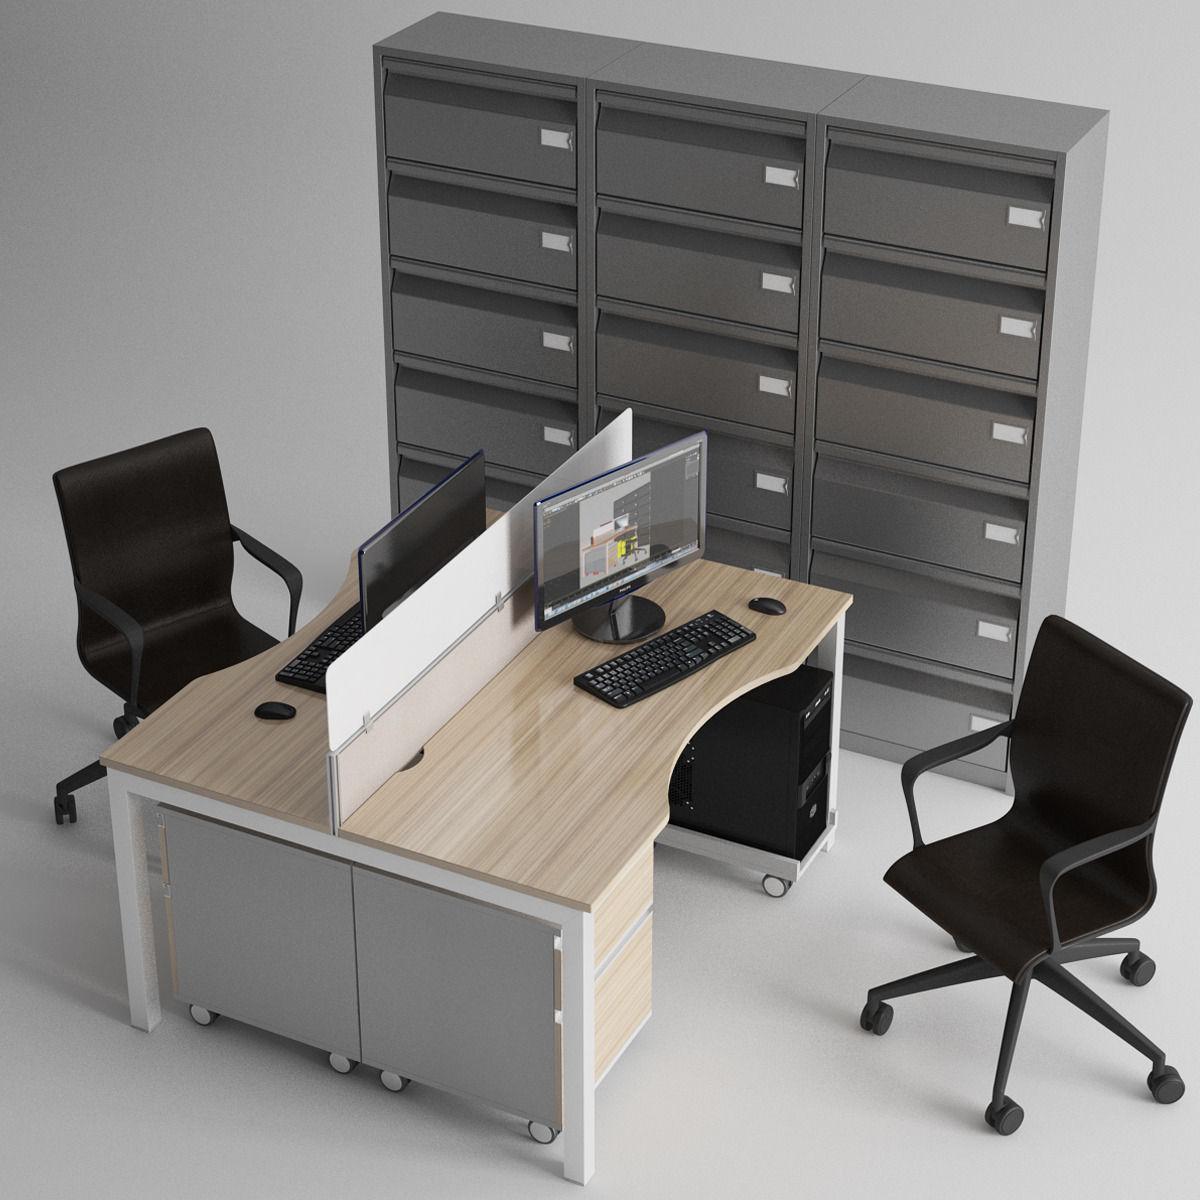 Popular CGAxis Models Volume 11 Office Furniture 3D Model Max Obj Fbx C4d